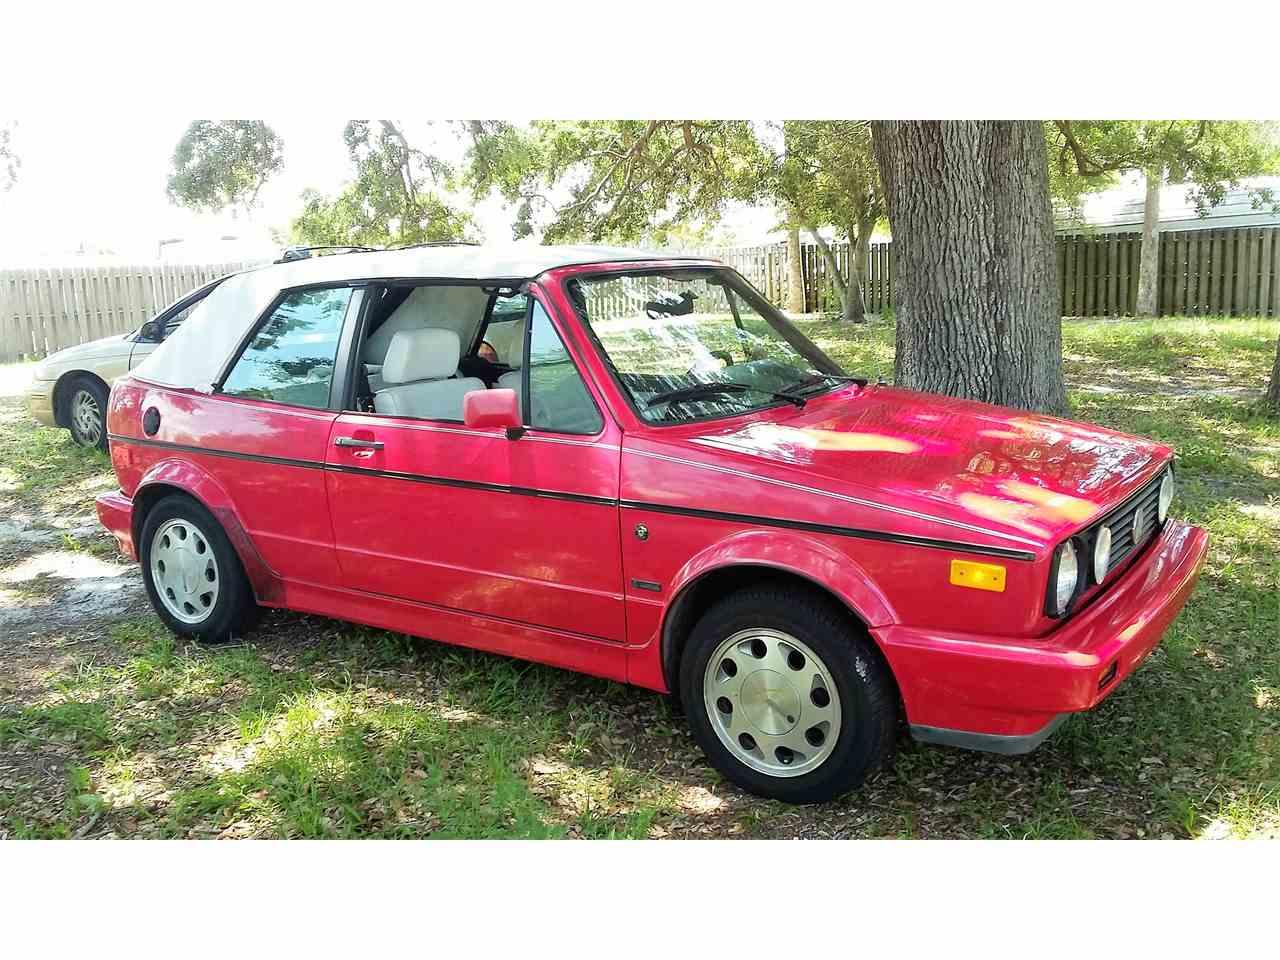 1992 Volkswagen Cabriolet For Sale Classiccars Com Cc